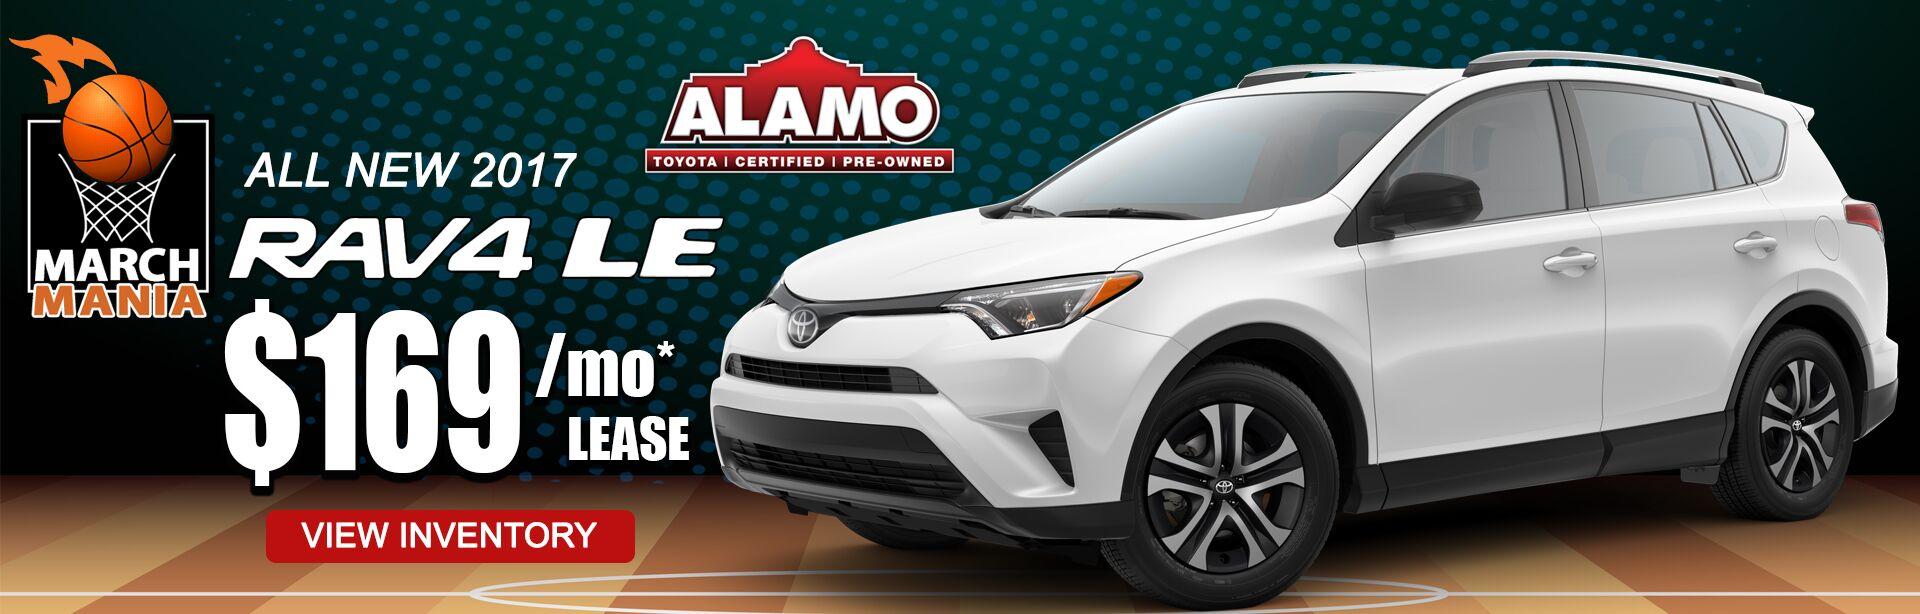 Toyota Dealership San Antonio Tx Used Cars Alamo Toyota